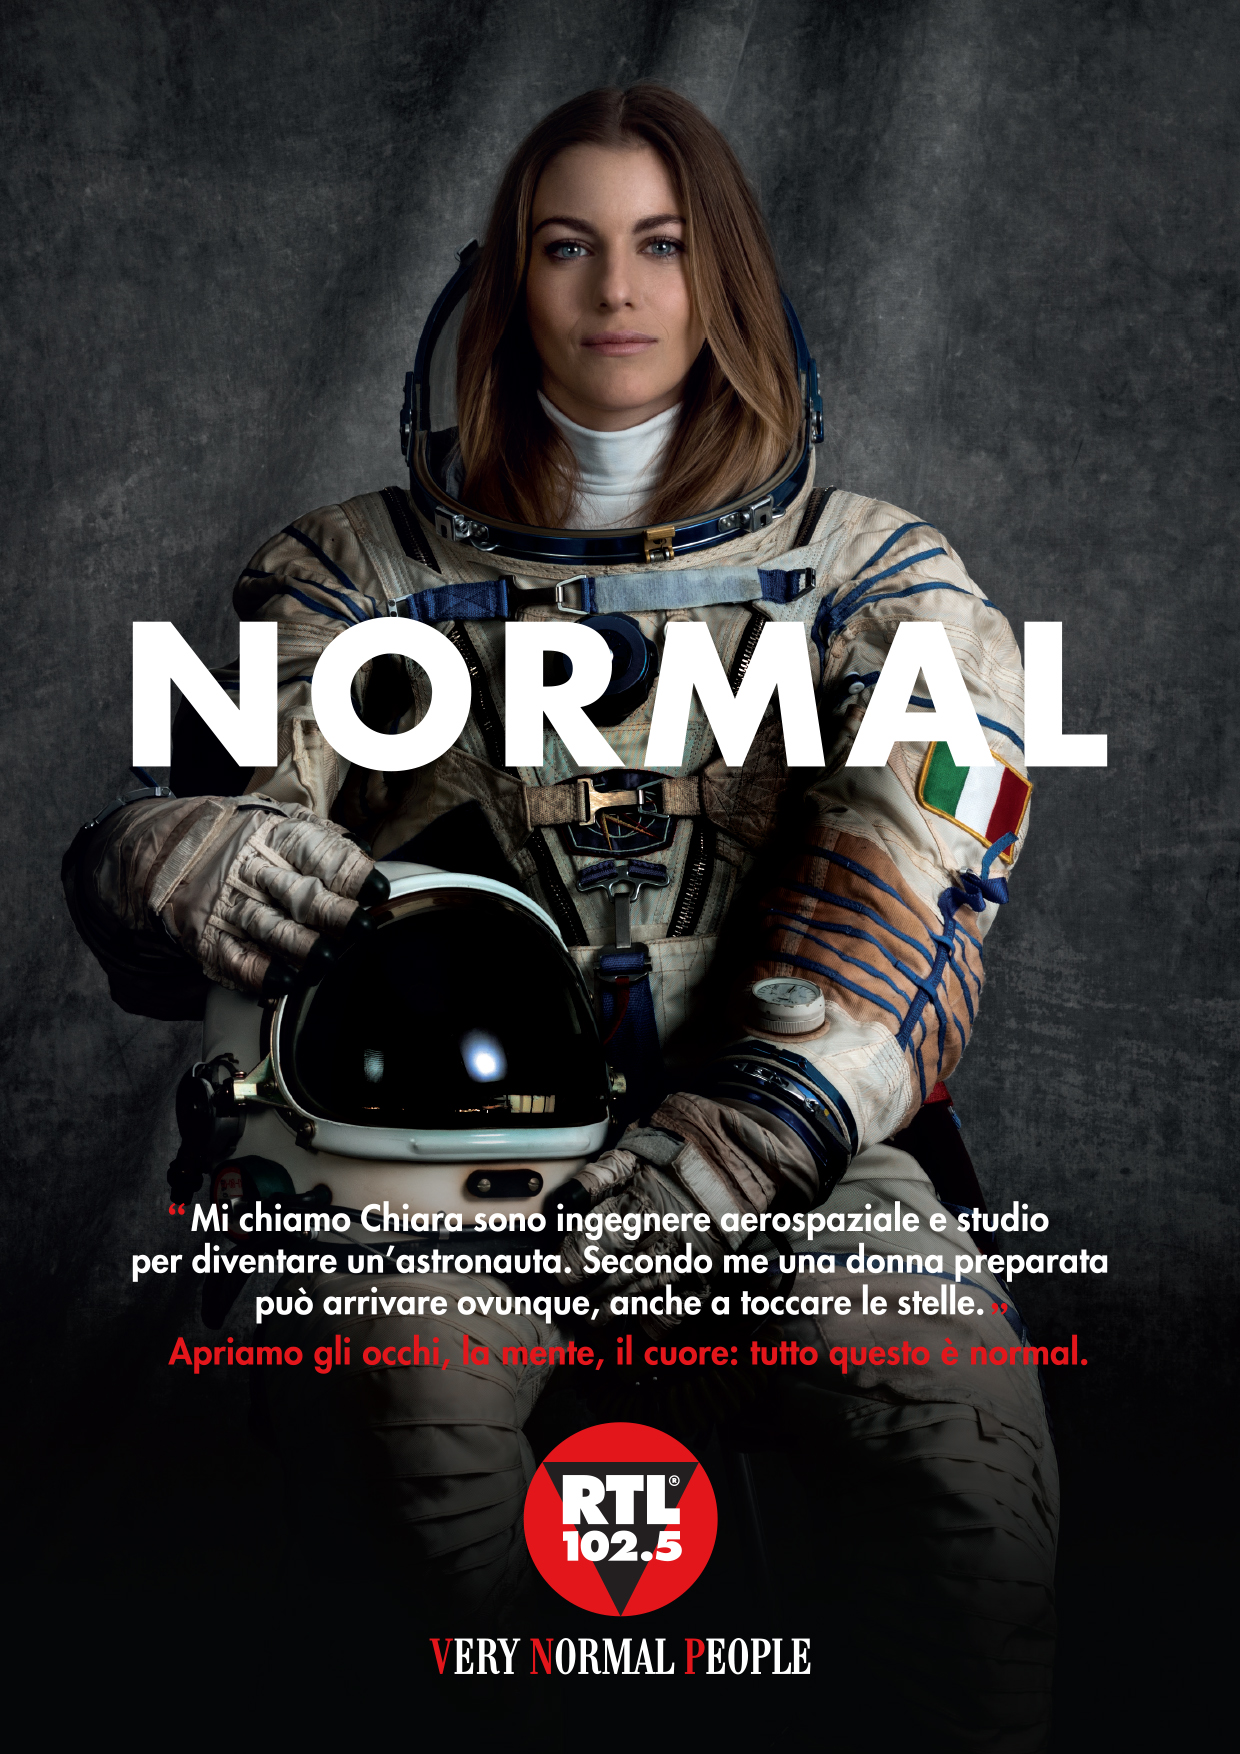 RTL1025_Pagina ADV_Gender_Equality